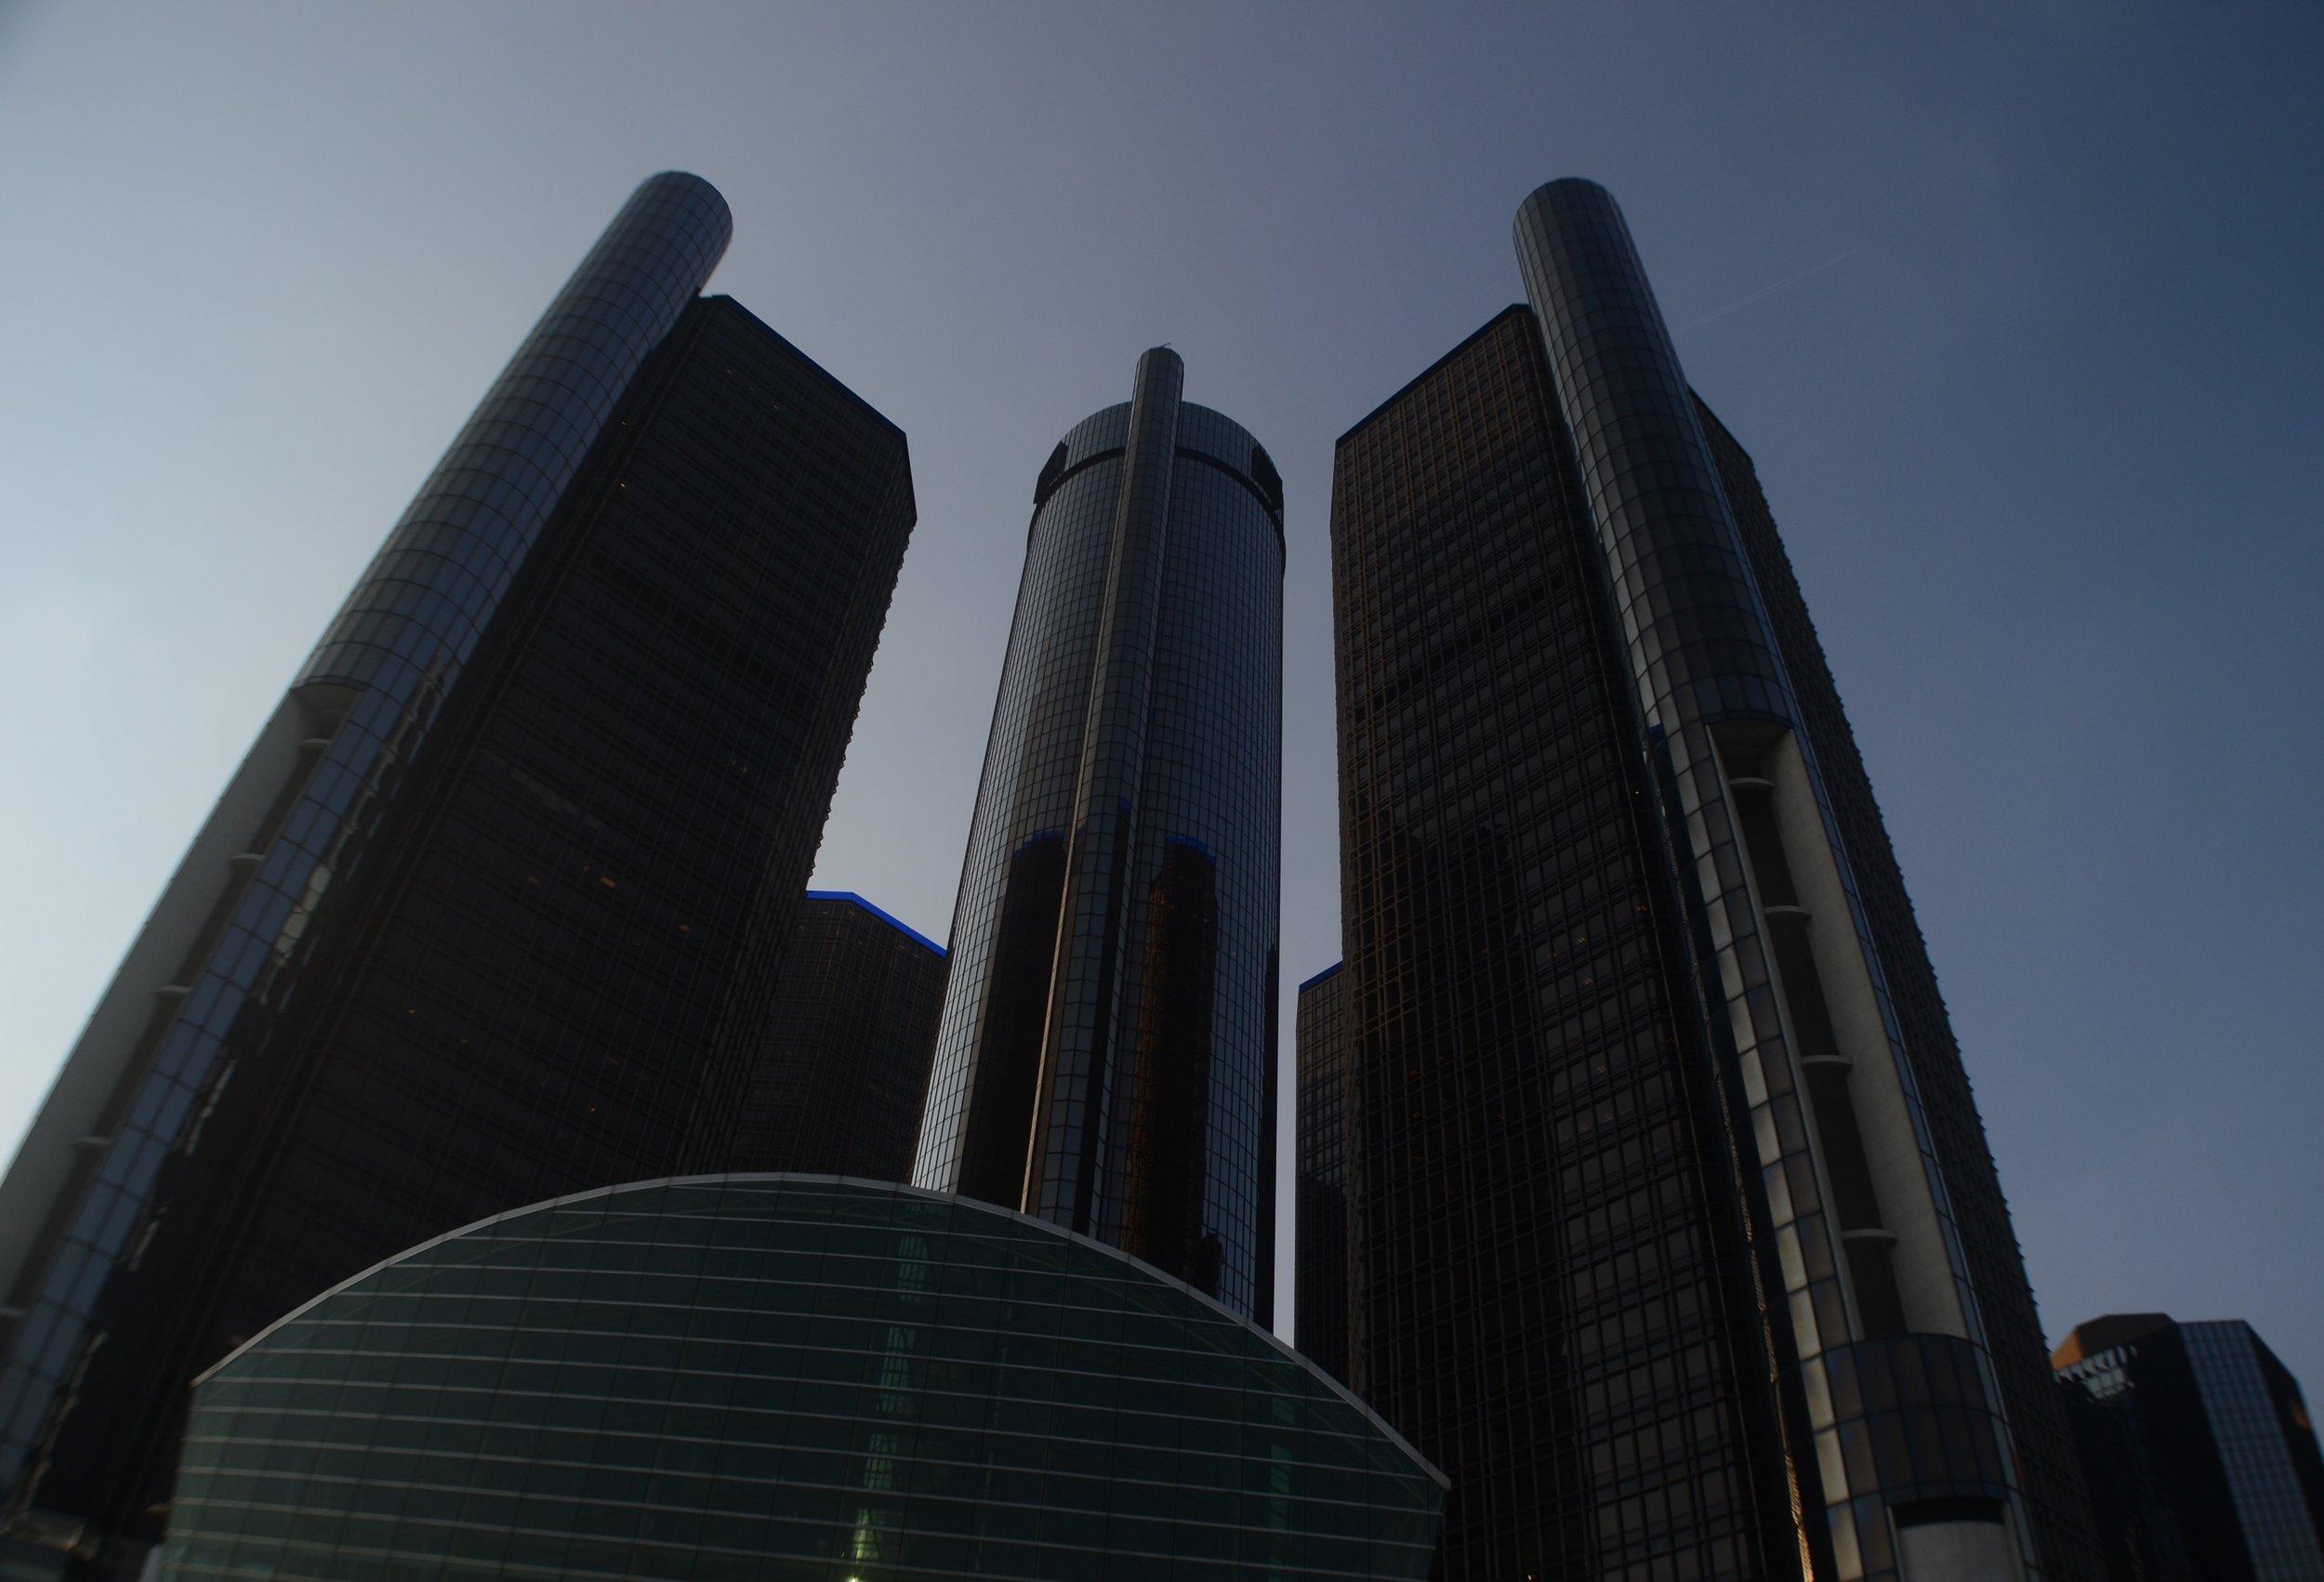 Sept. 1, 2011